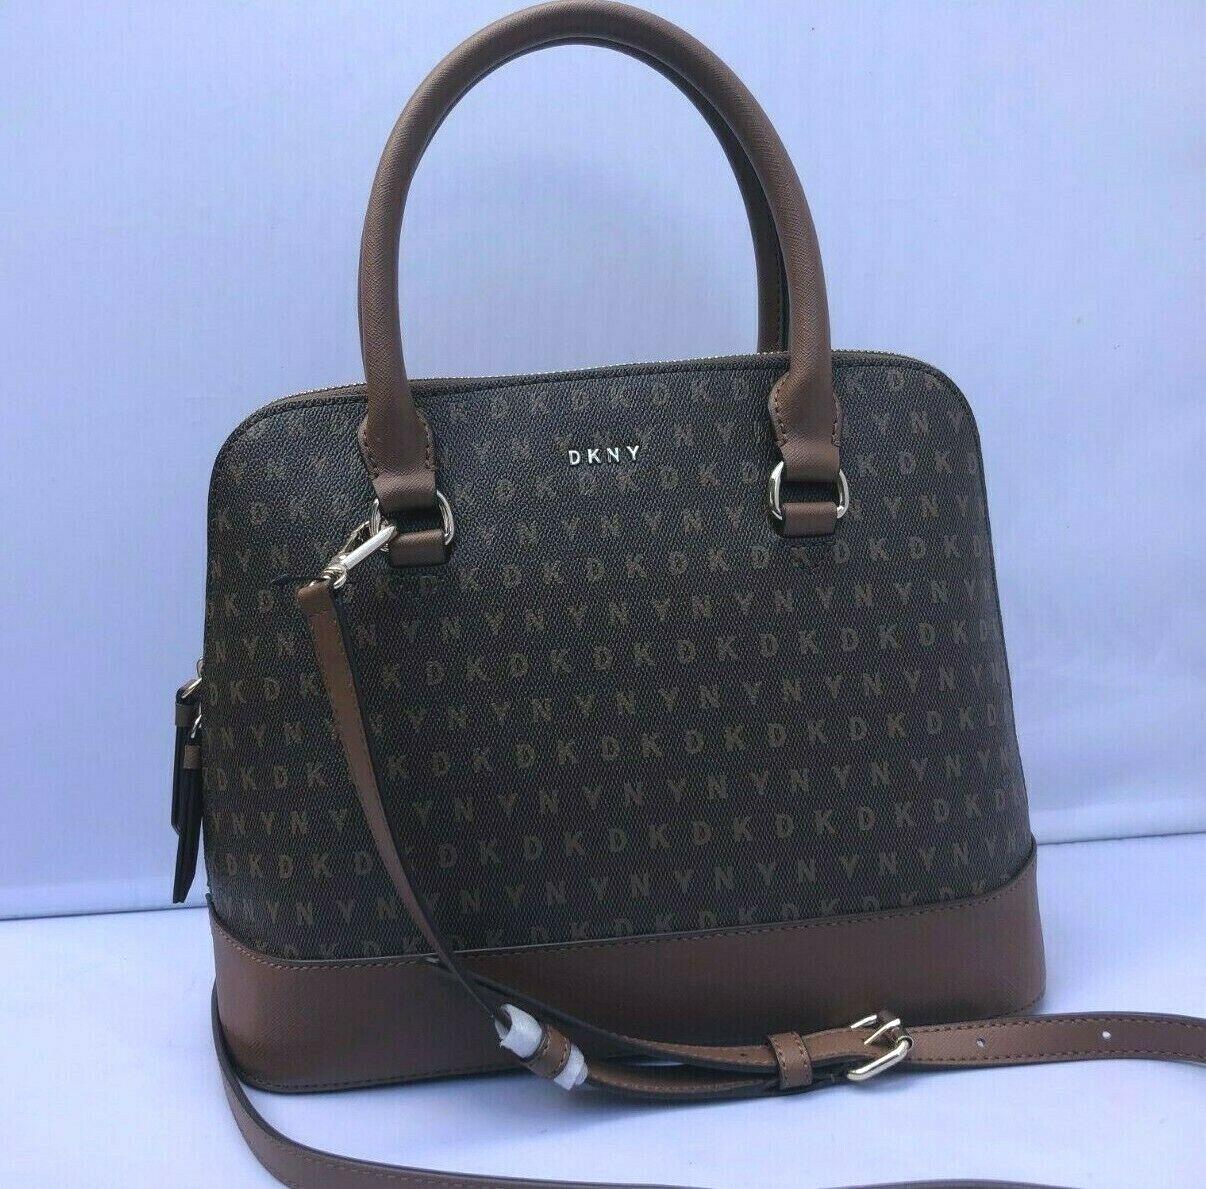 bryant dome logo md round satchel bag